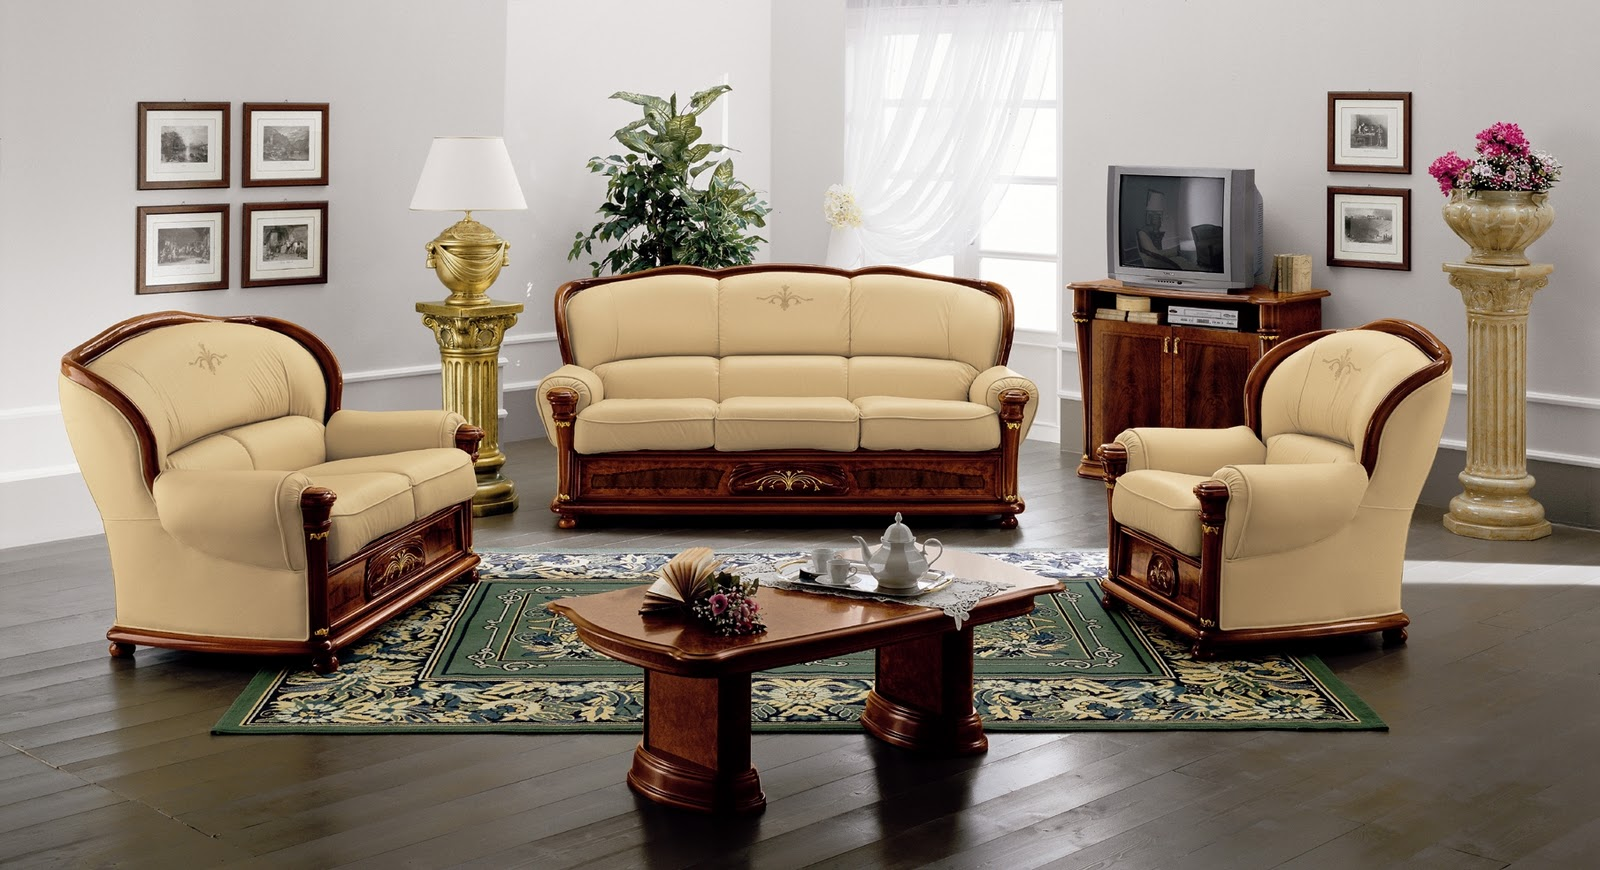 ergonomic chair in pakistan patio accessories office furniture design style yvotube